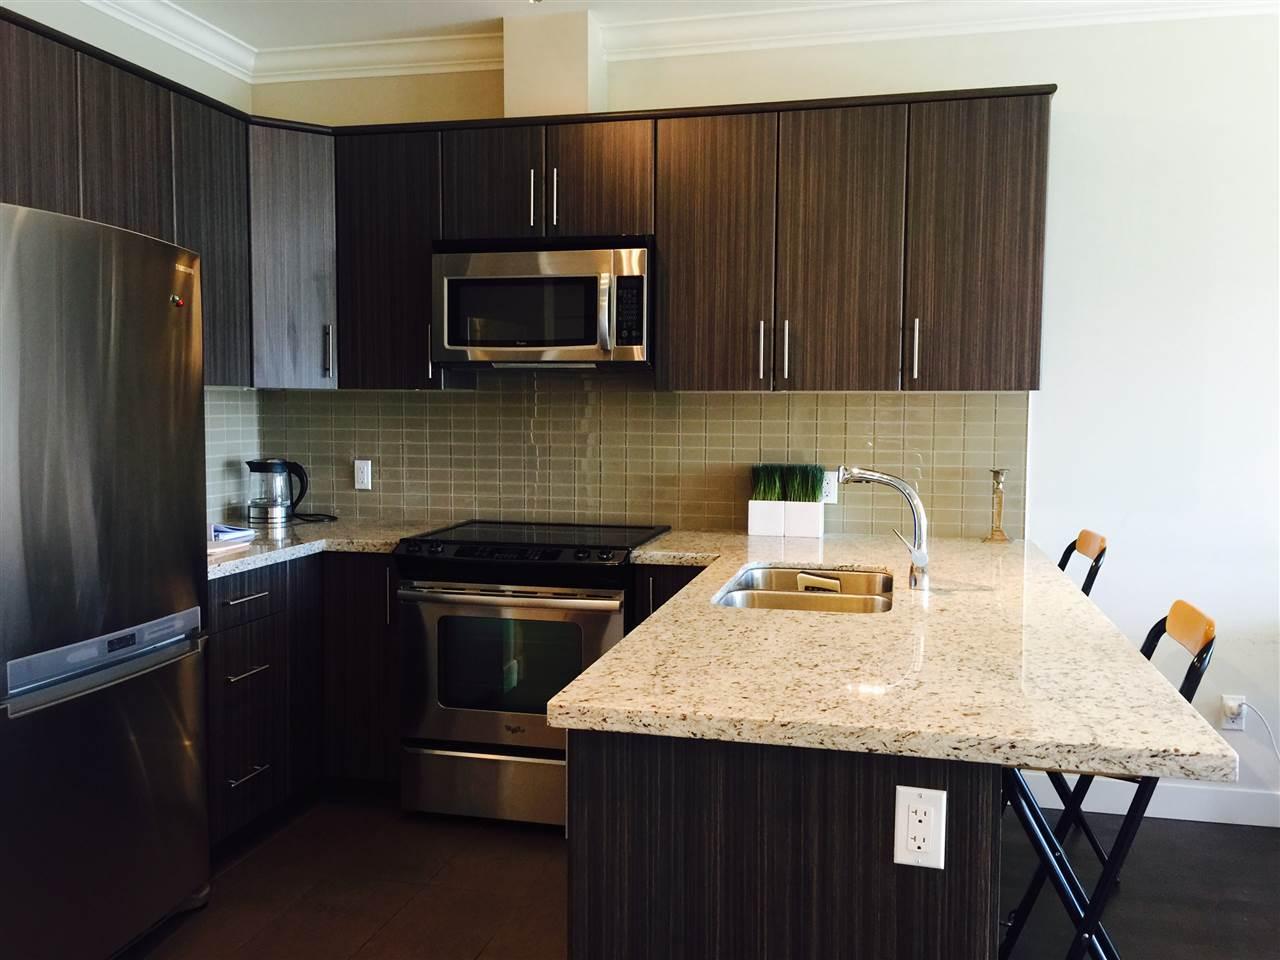 Condo Apartment at 201 6888 ROYAL OAK AVENUE, Unit 201, Burnaby South, British Columbia. Image 7